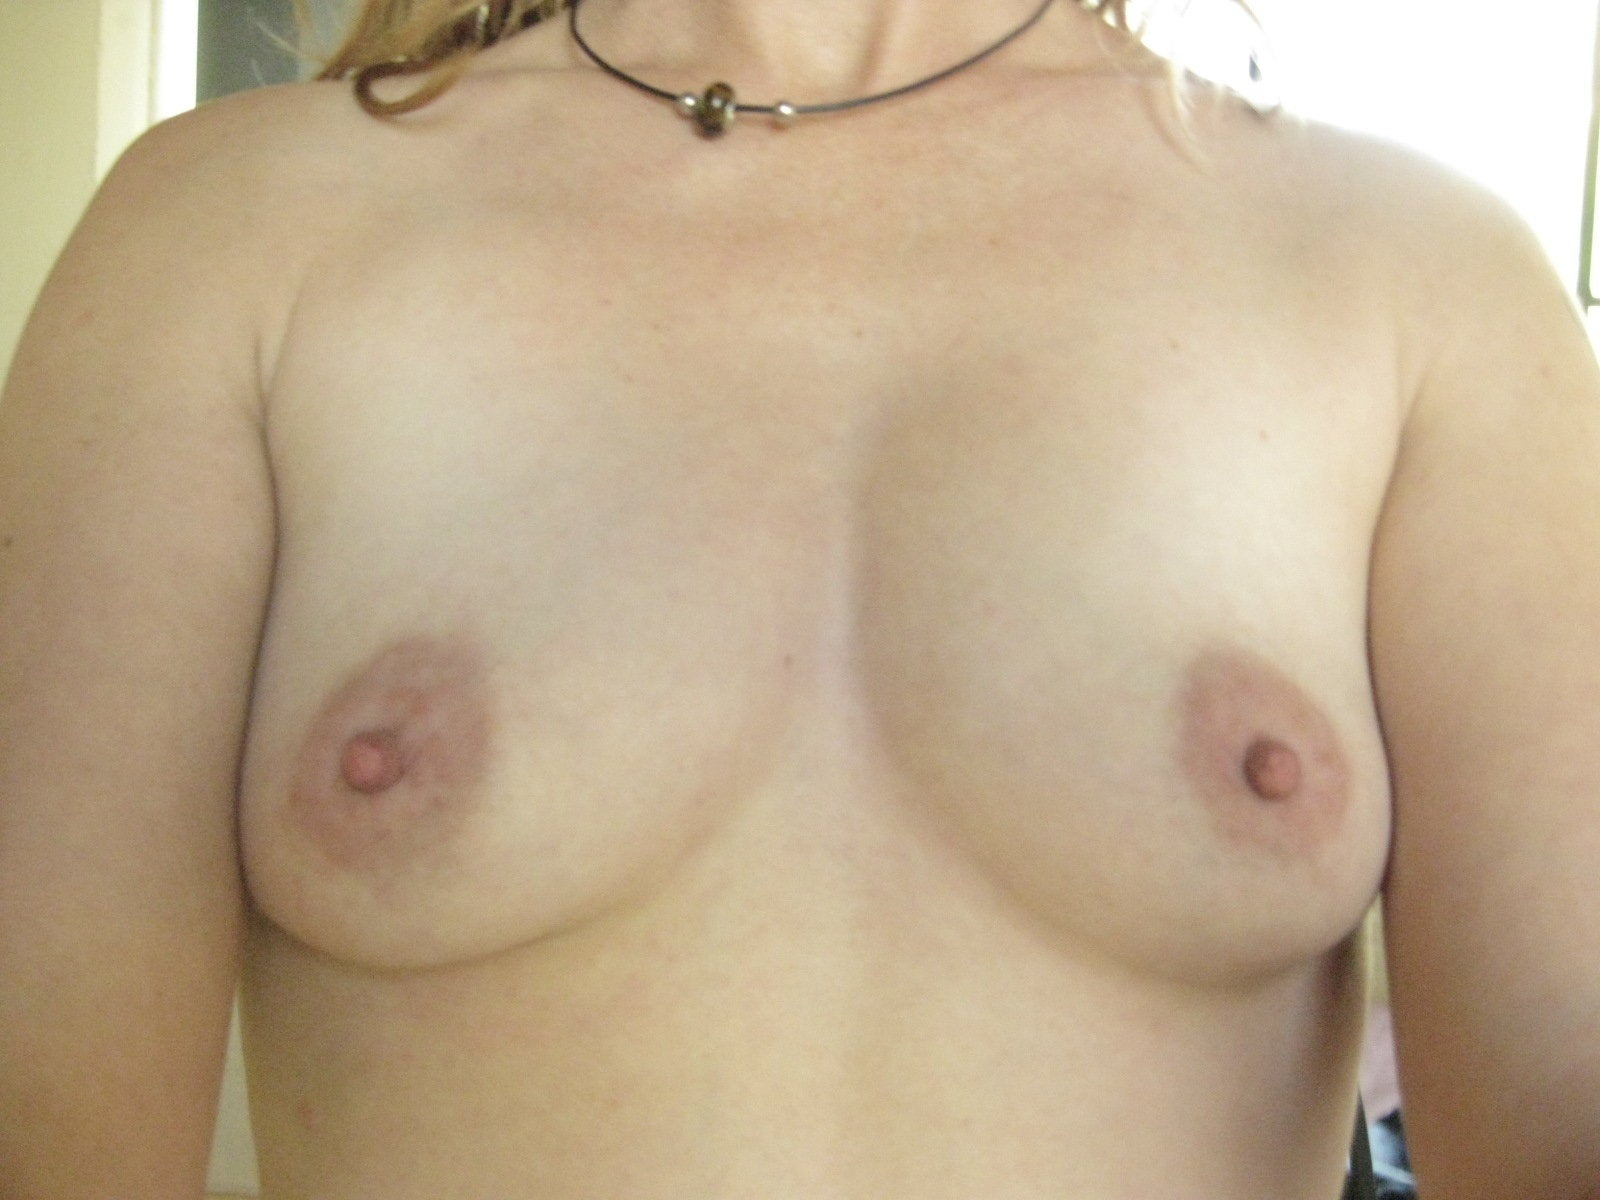 size d34 boobs jpg 1200x900